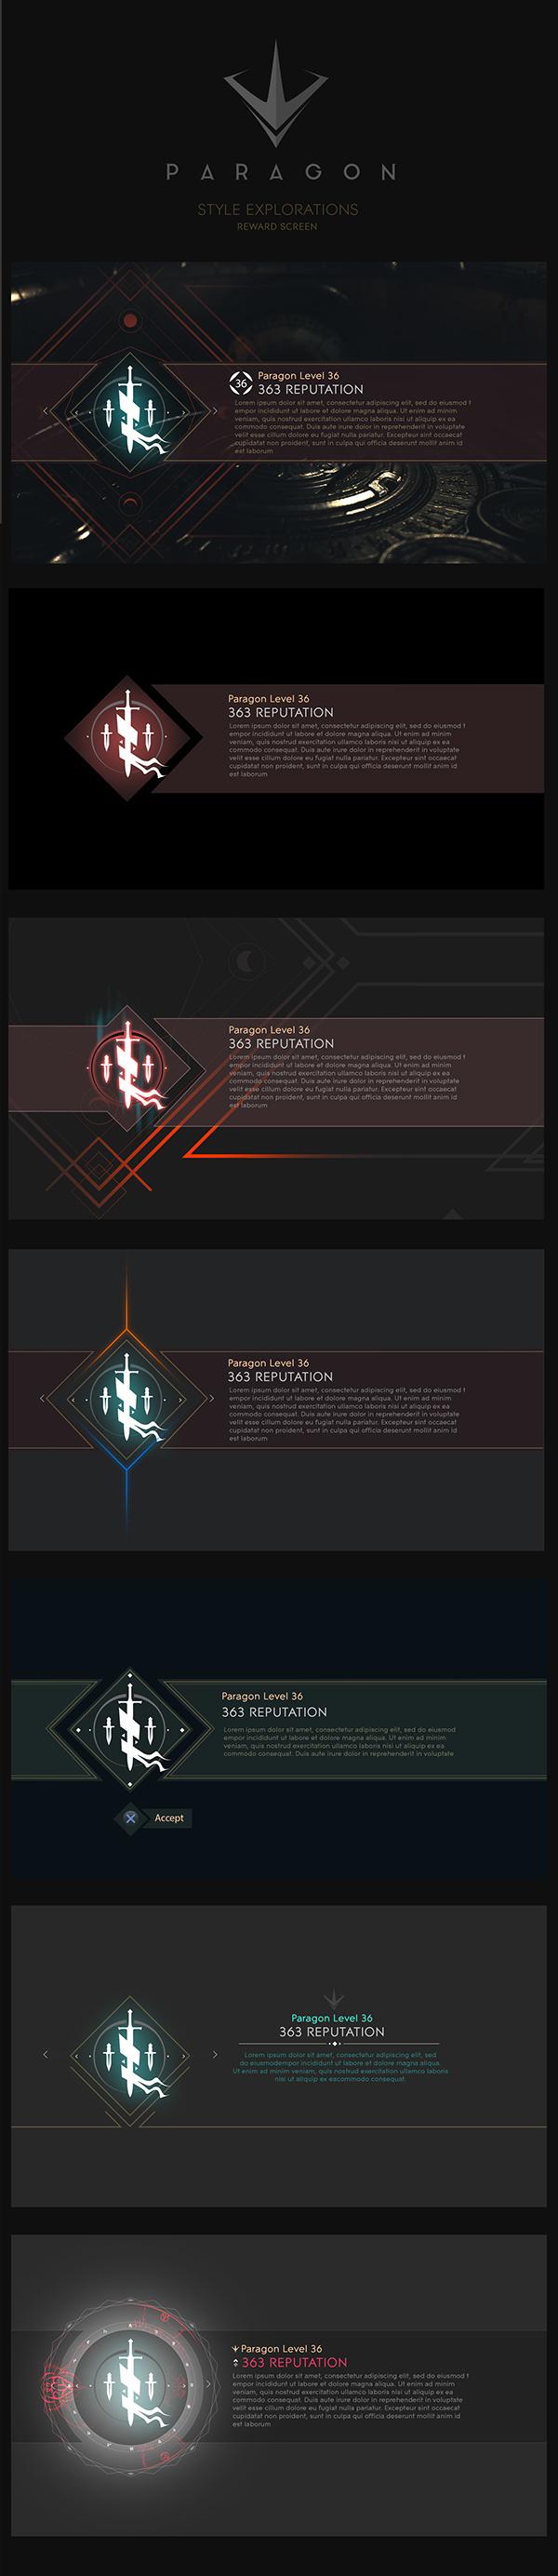 PARAGON - Iconography, UI & HUD - EPIC GAMES